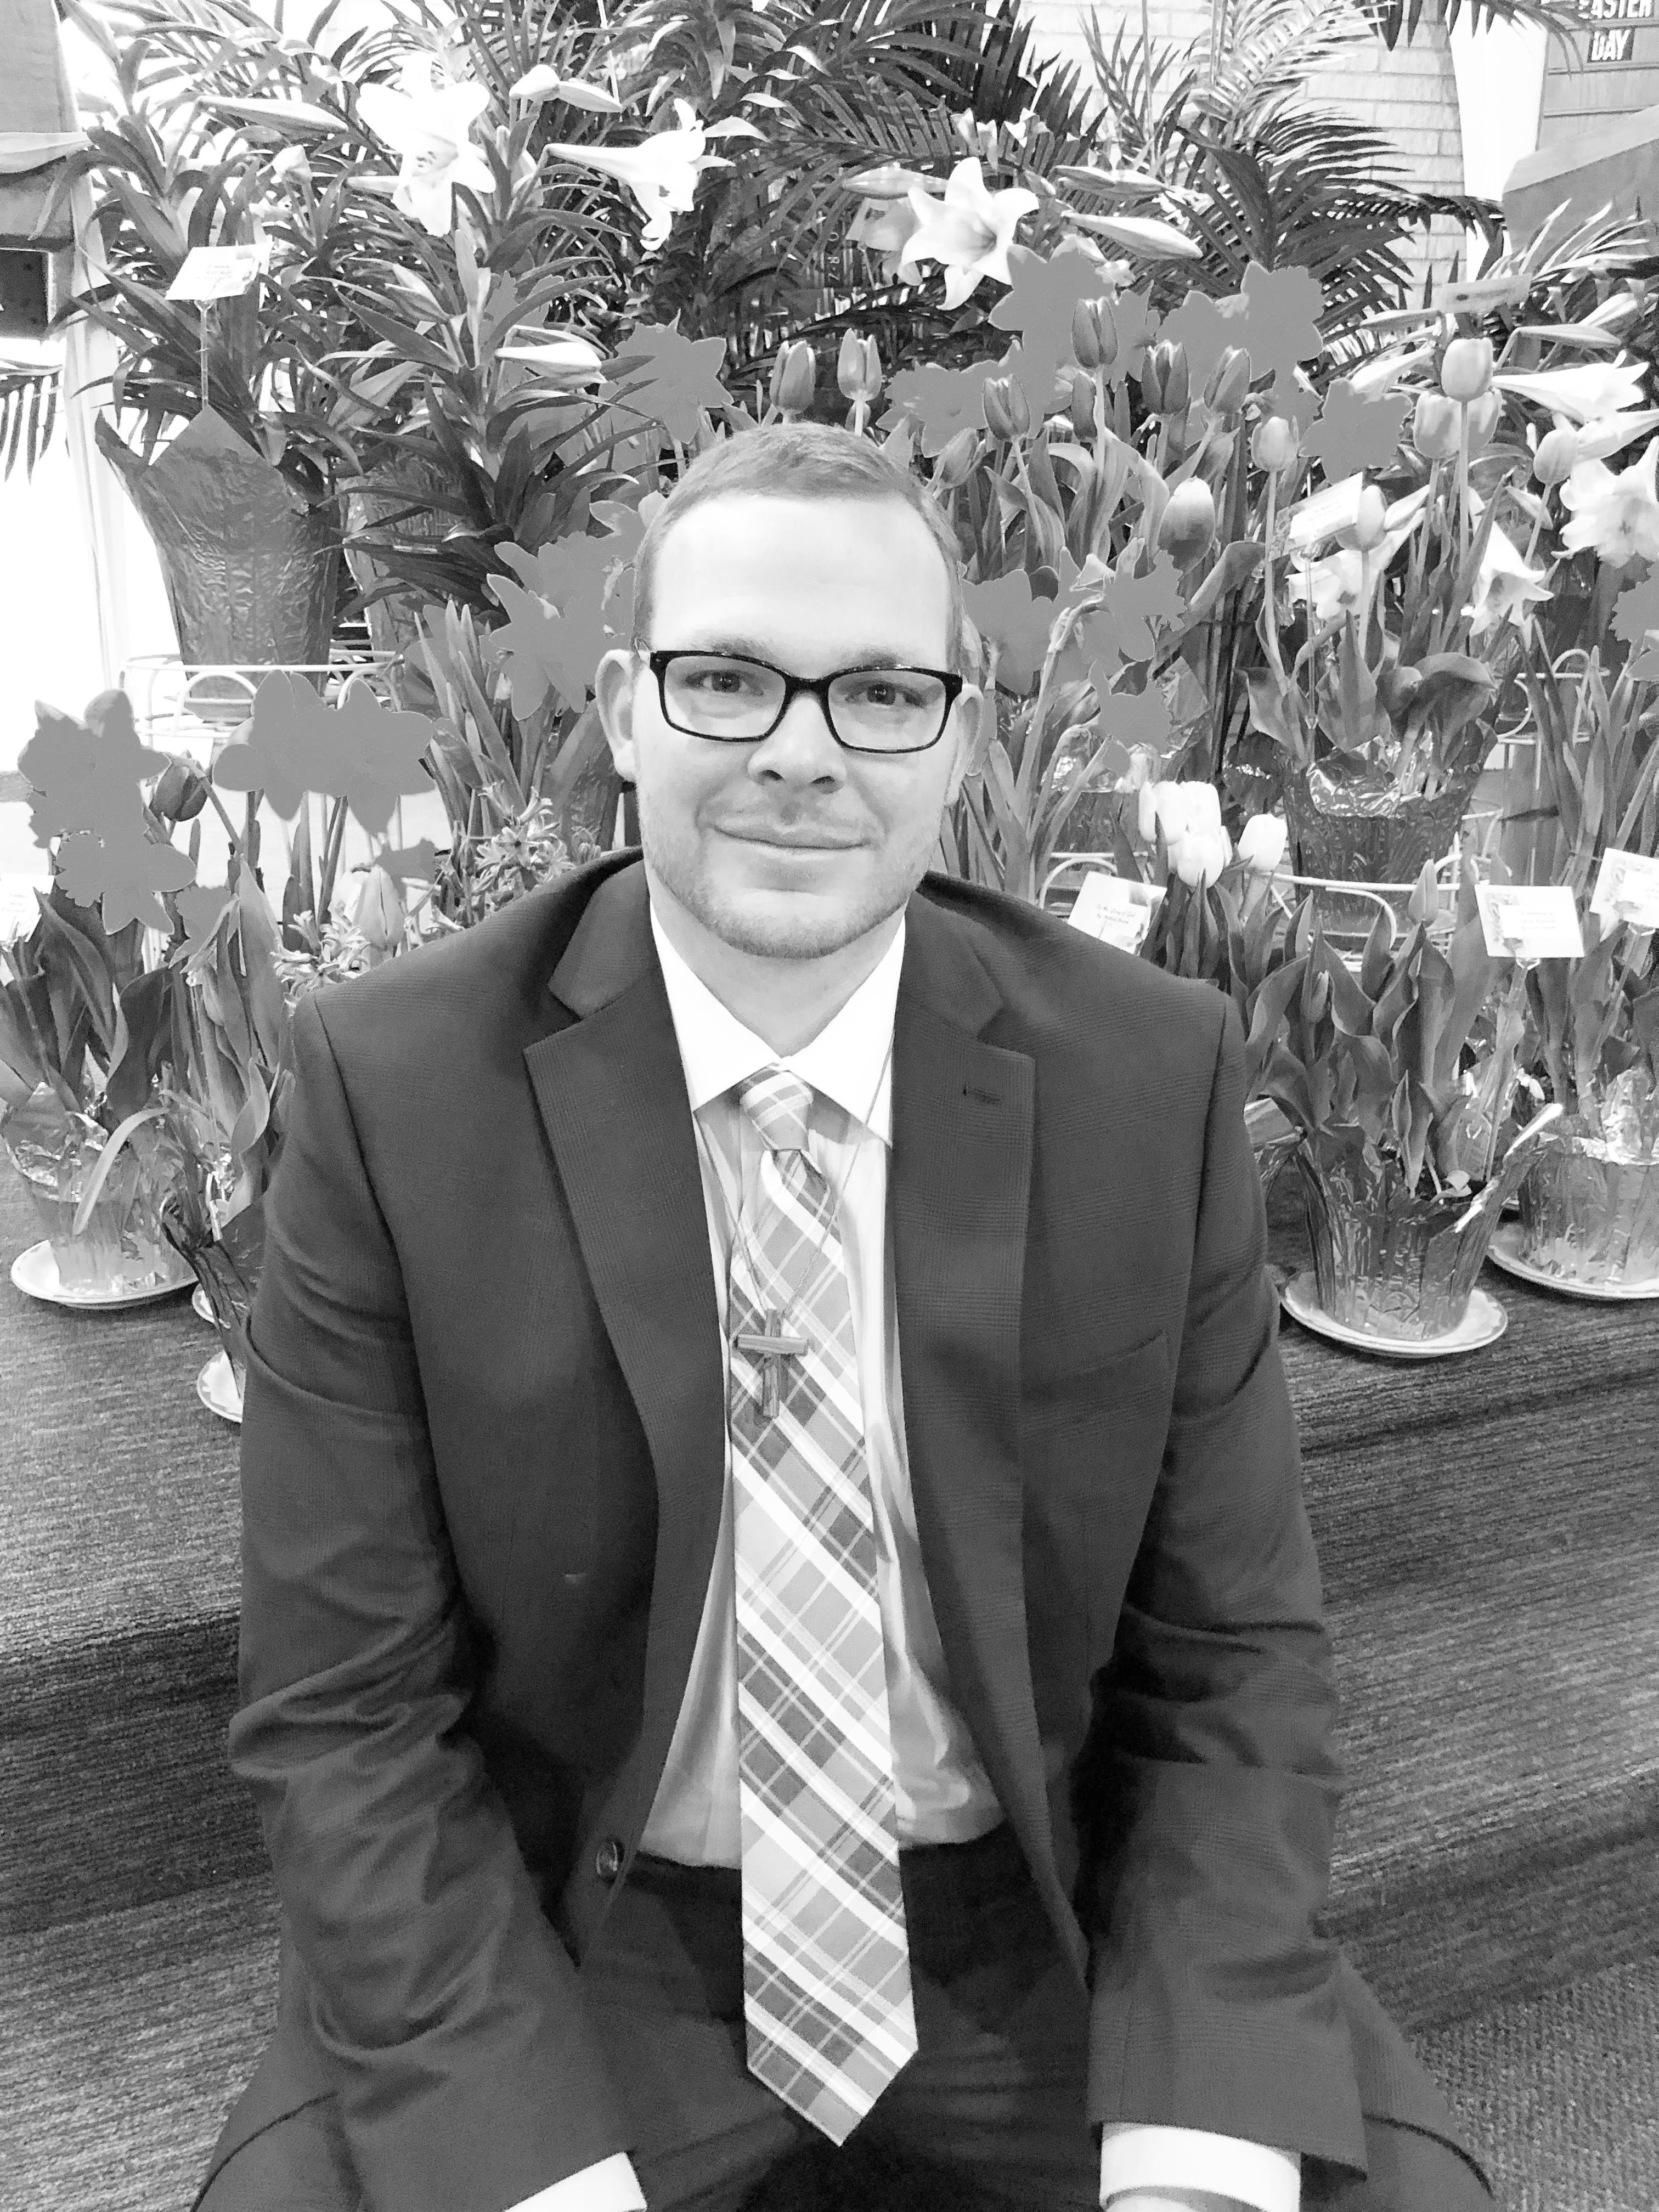 Pastor Shawn Hannon